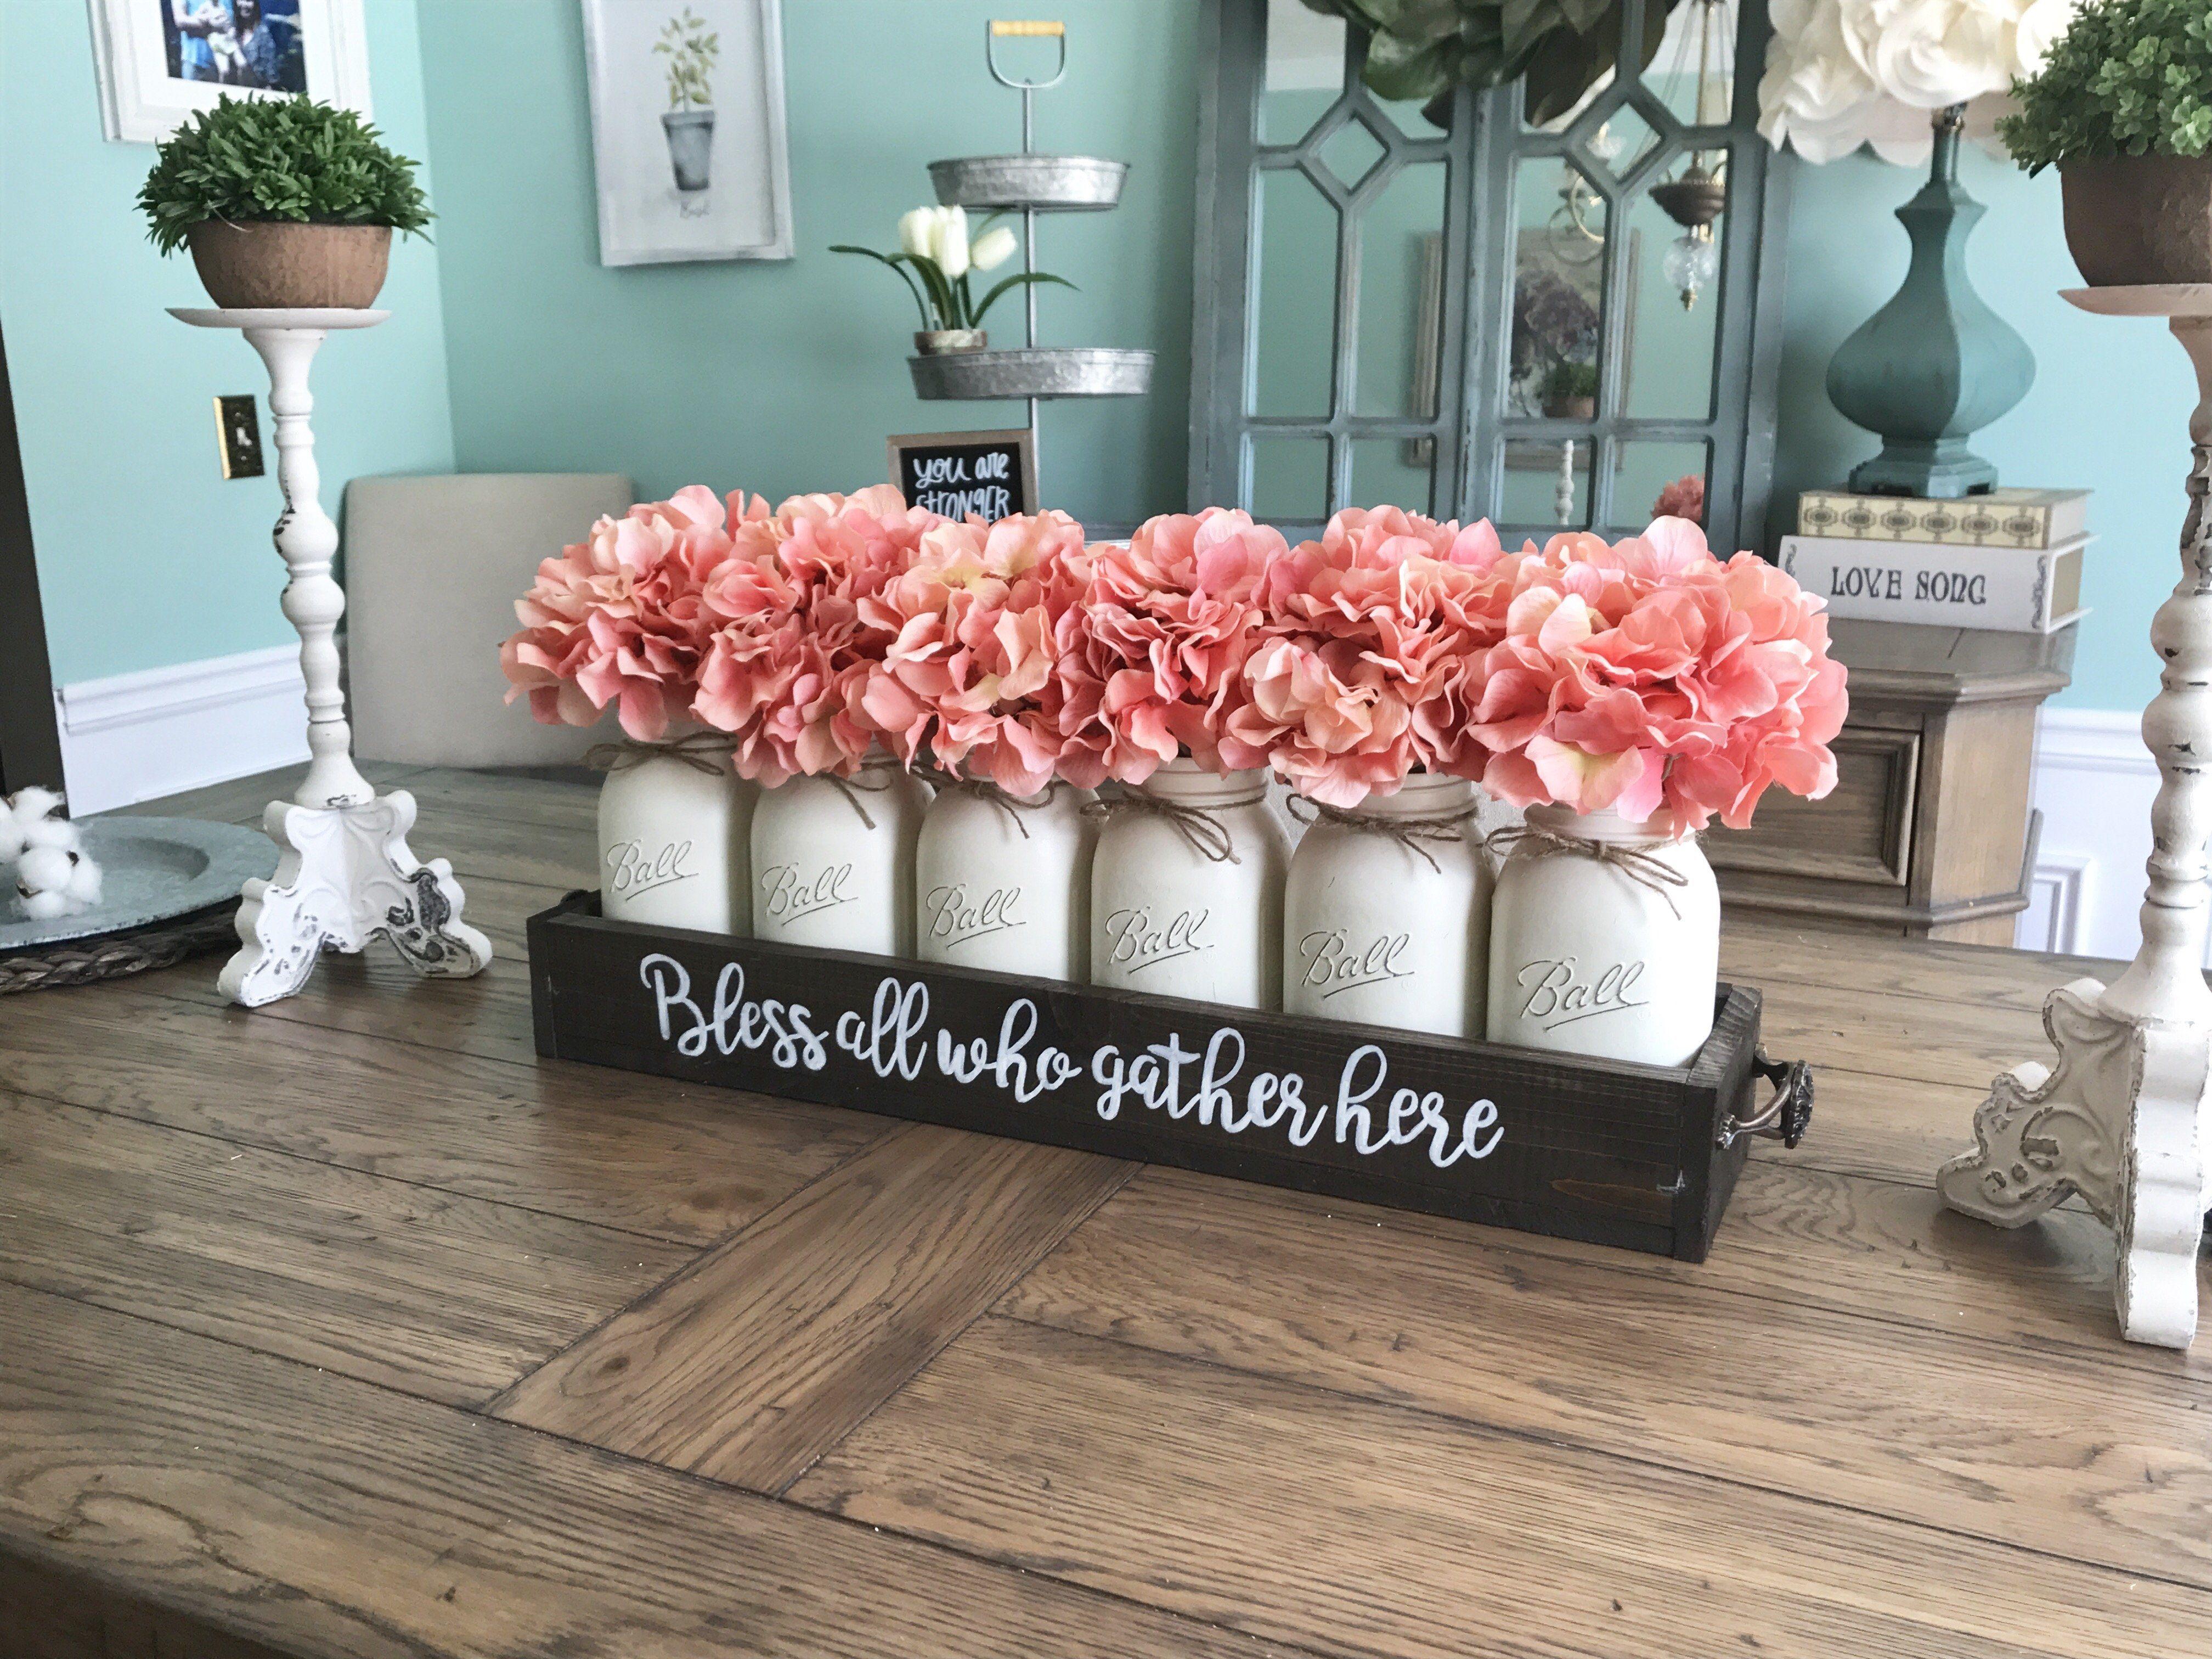 Bless All Who Gather Here Mason Jar Centerpiece Farmhouse Table Centerpieces Table Centerpieces For Home Farmhouse Table Decor